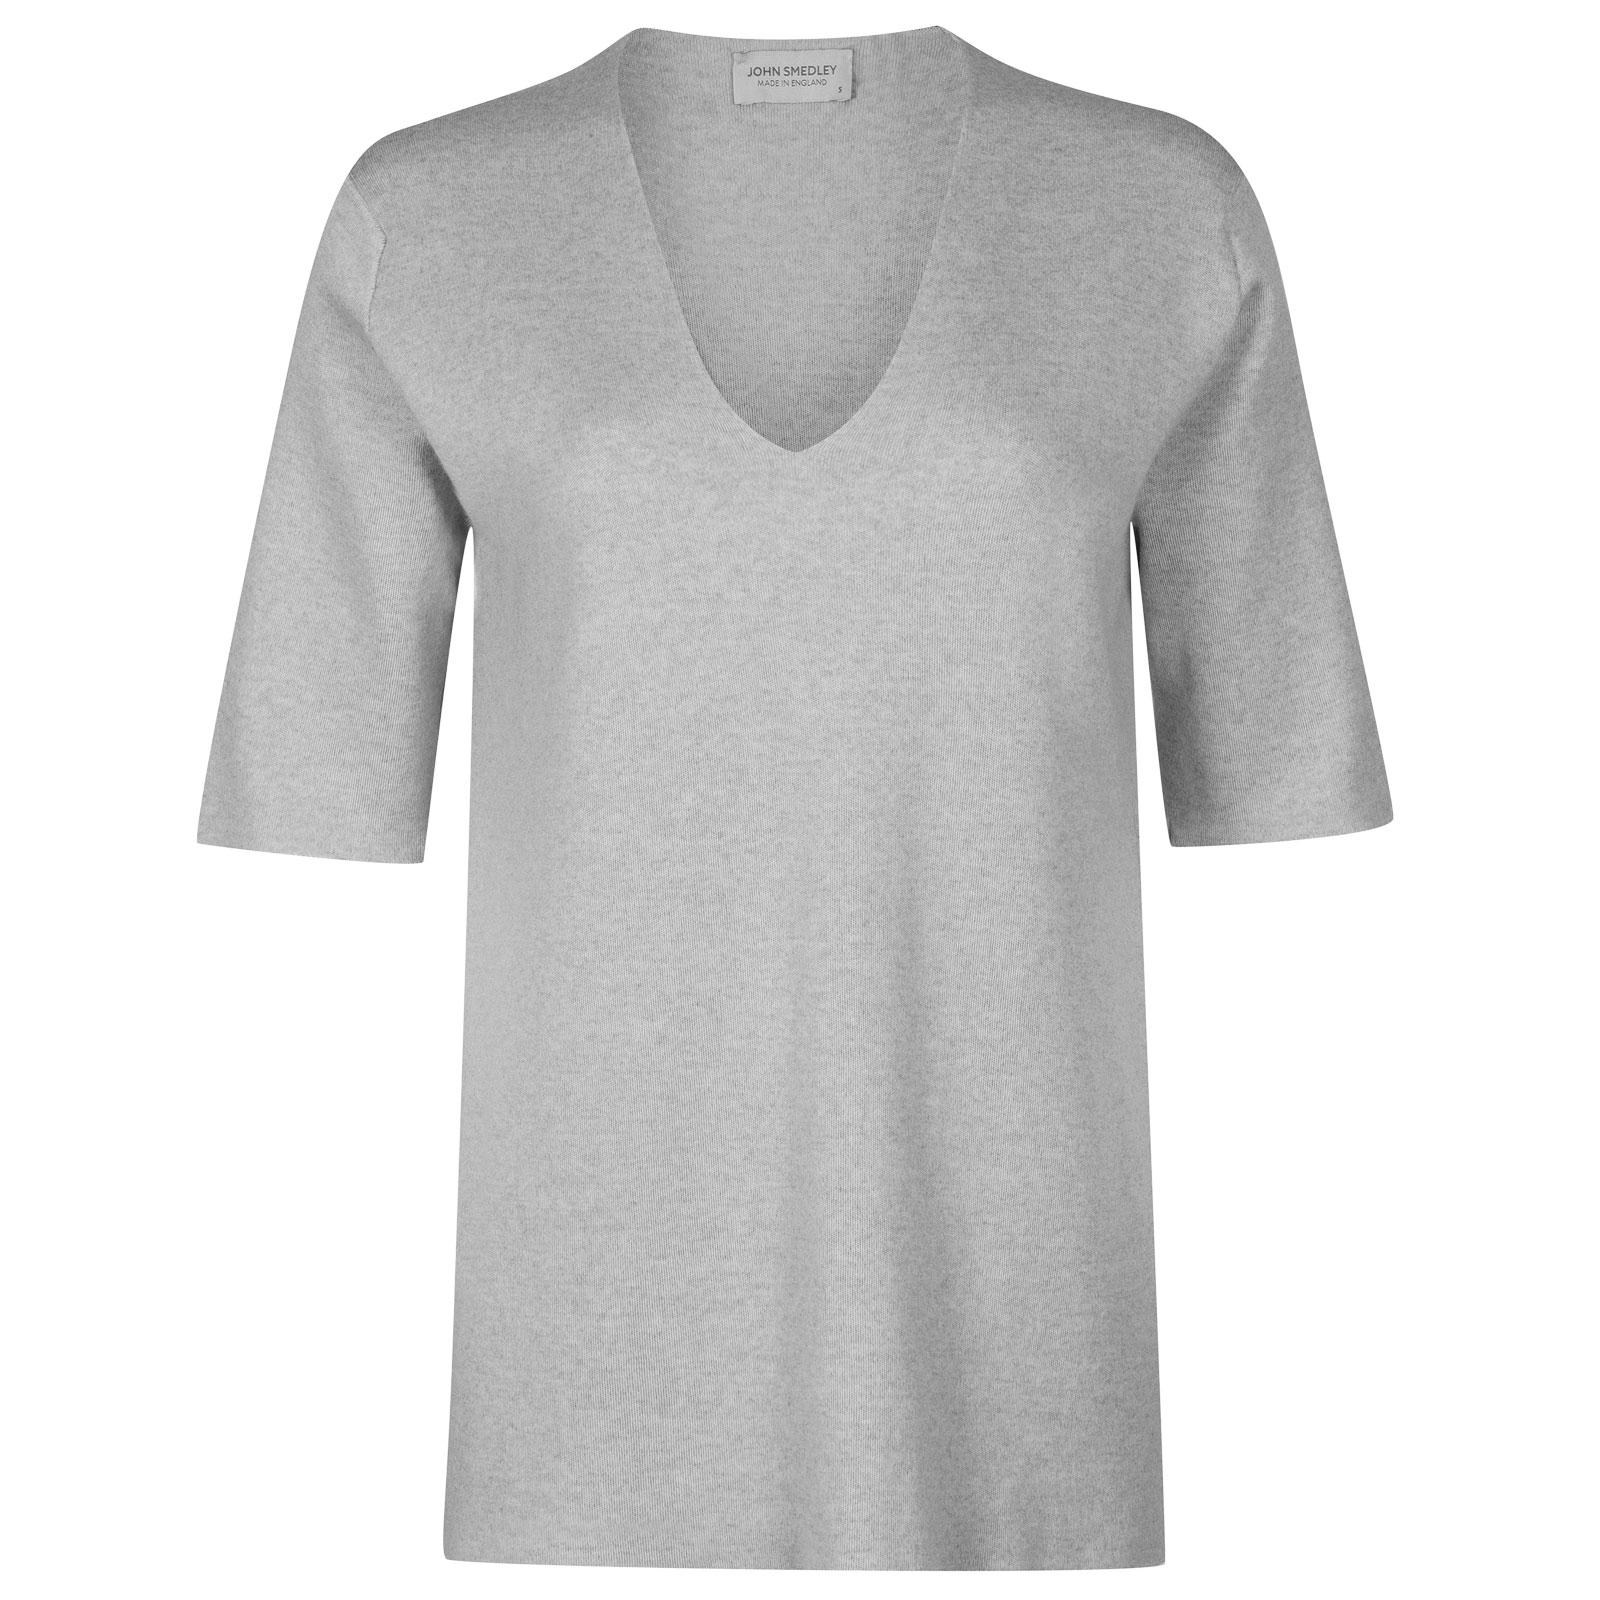 John Smedley purcell Merino Wool Sweater in Bardot Grey-L